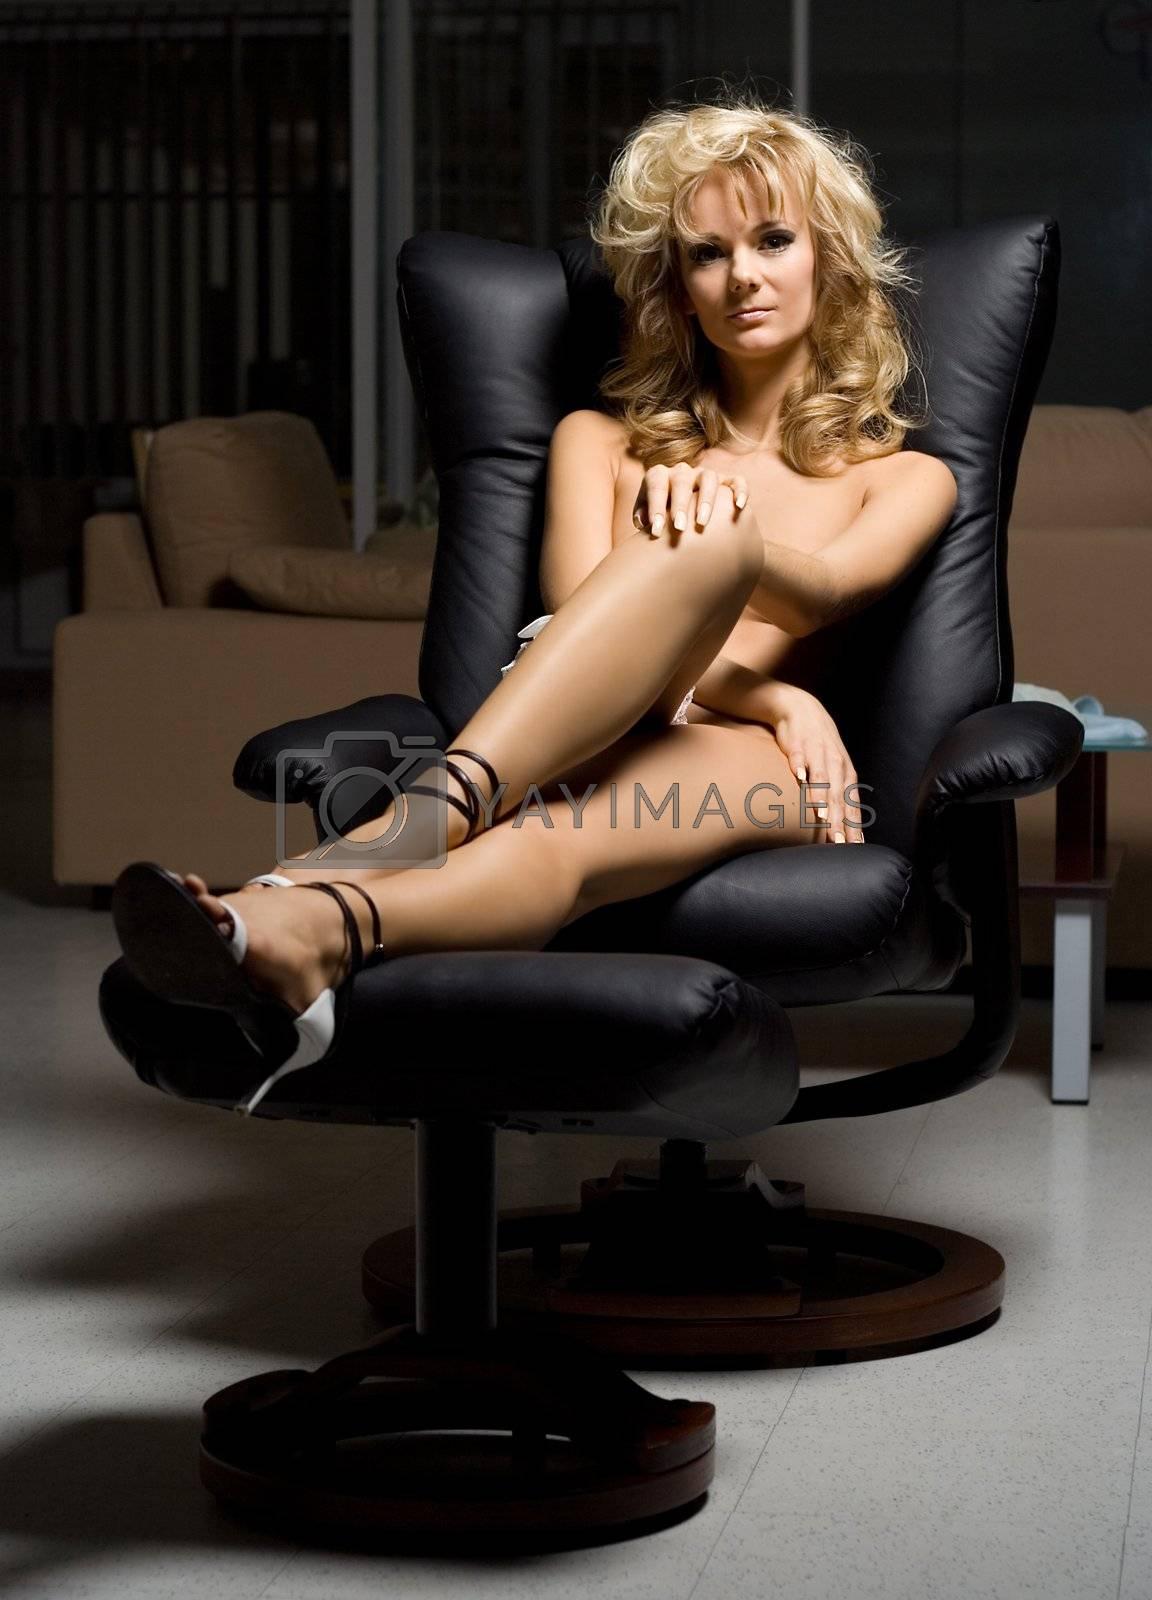 naked girl in black chair